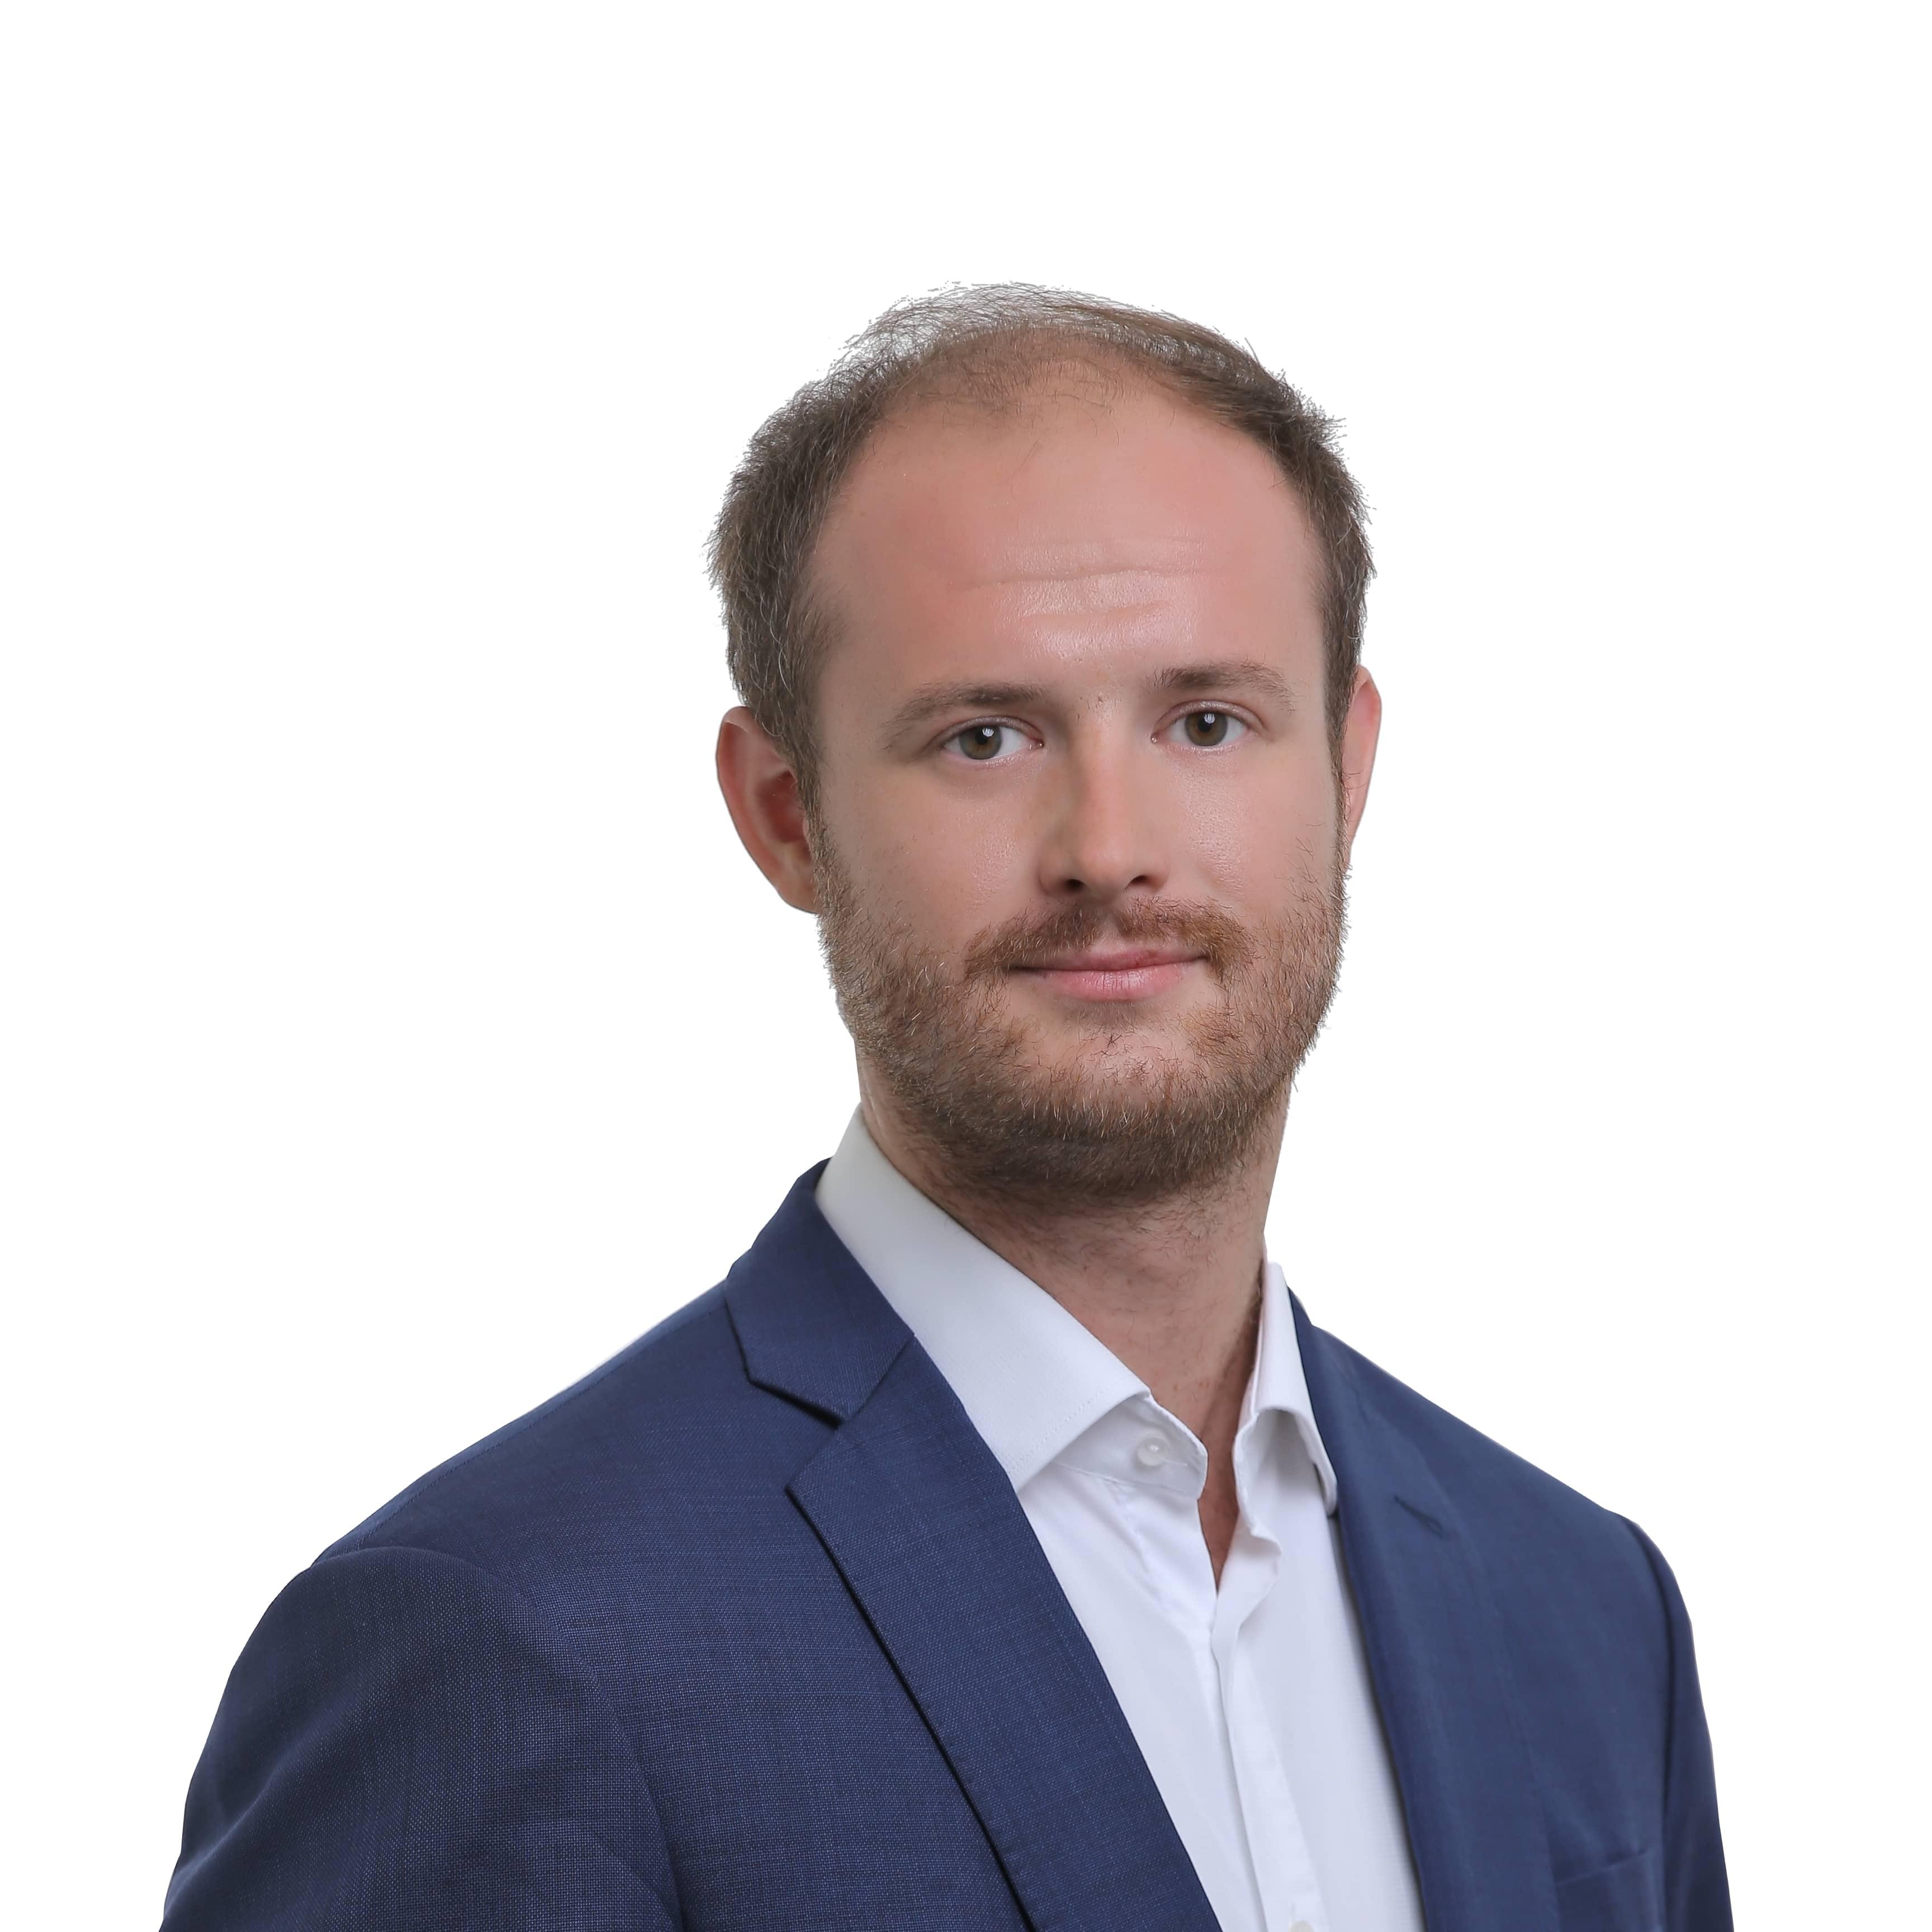 Jiří Köhler